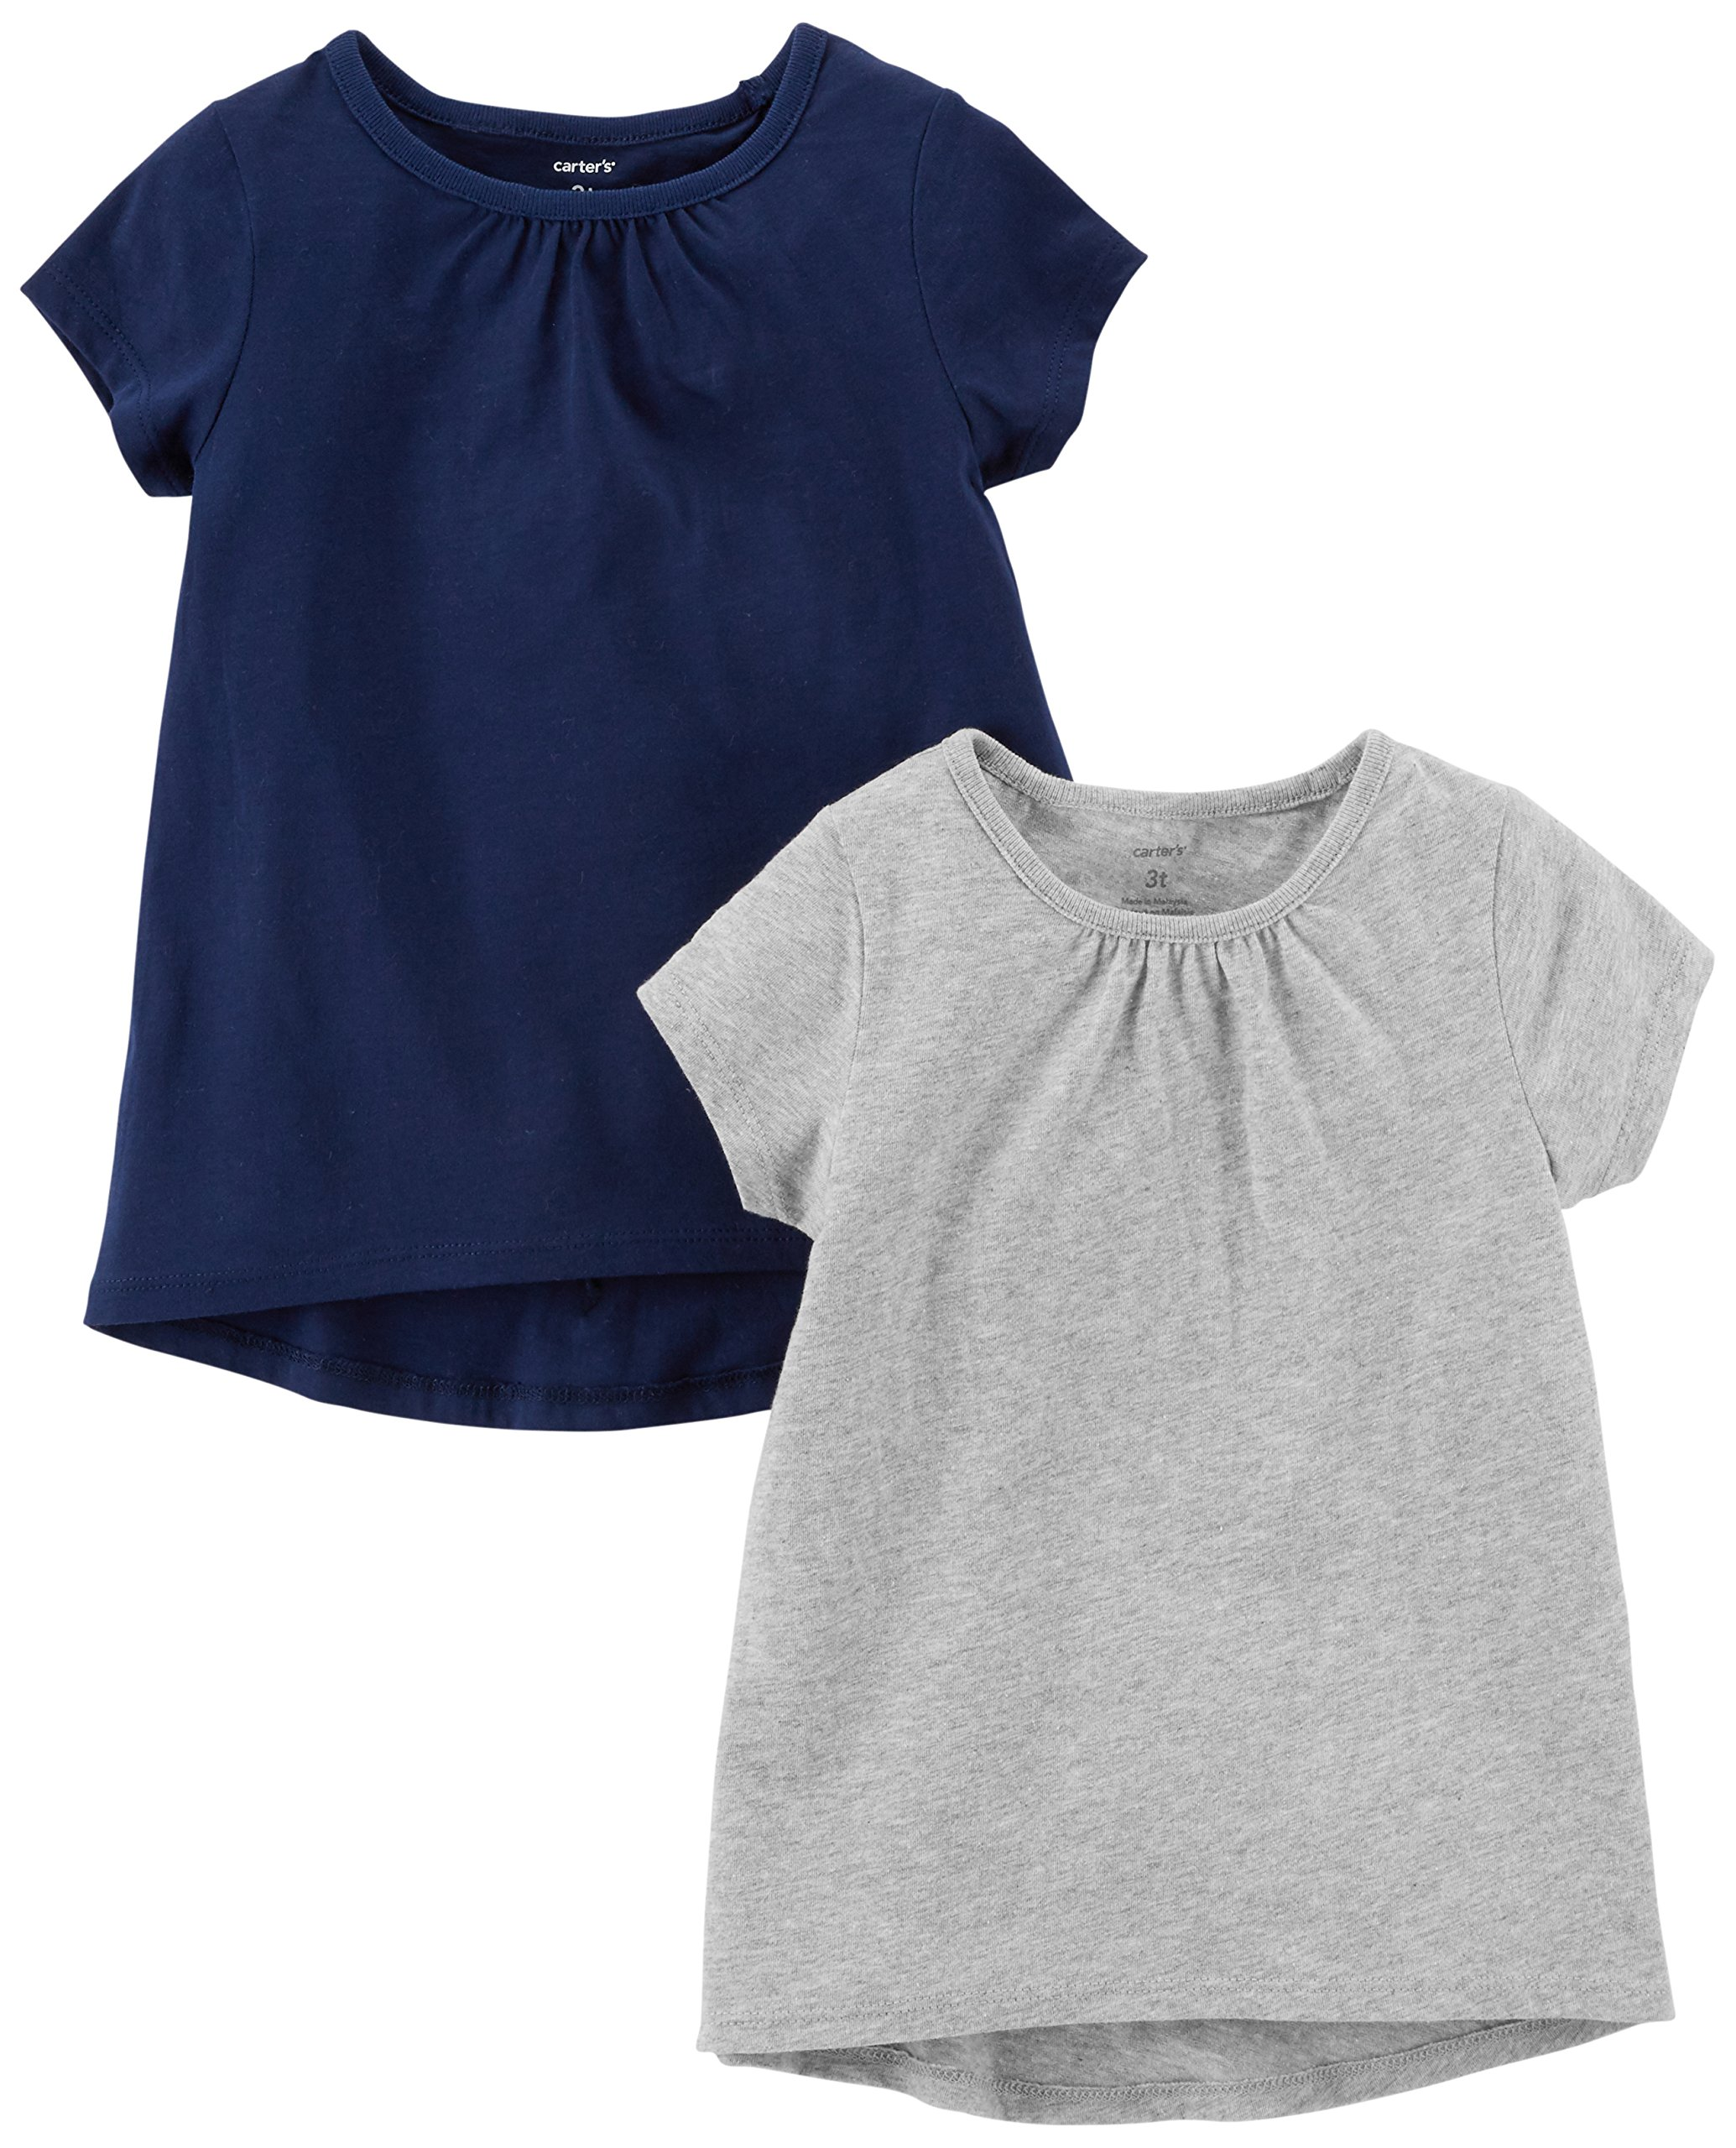 Carter's Girls' Toddler 2-Pack Tee, Navy/Grey, 2T